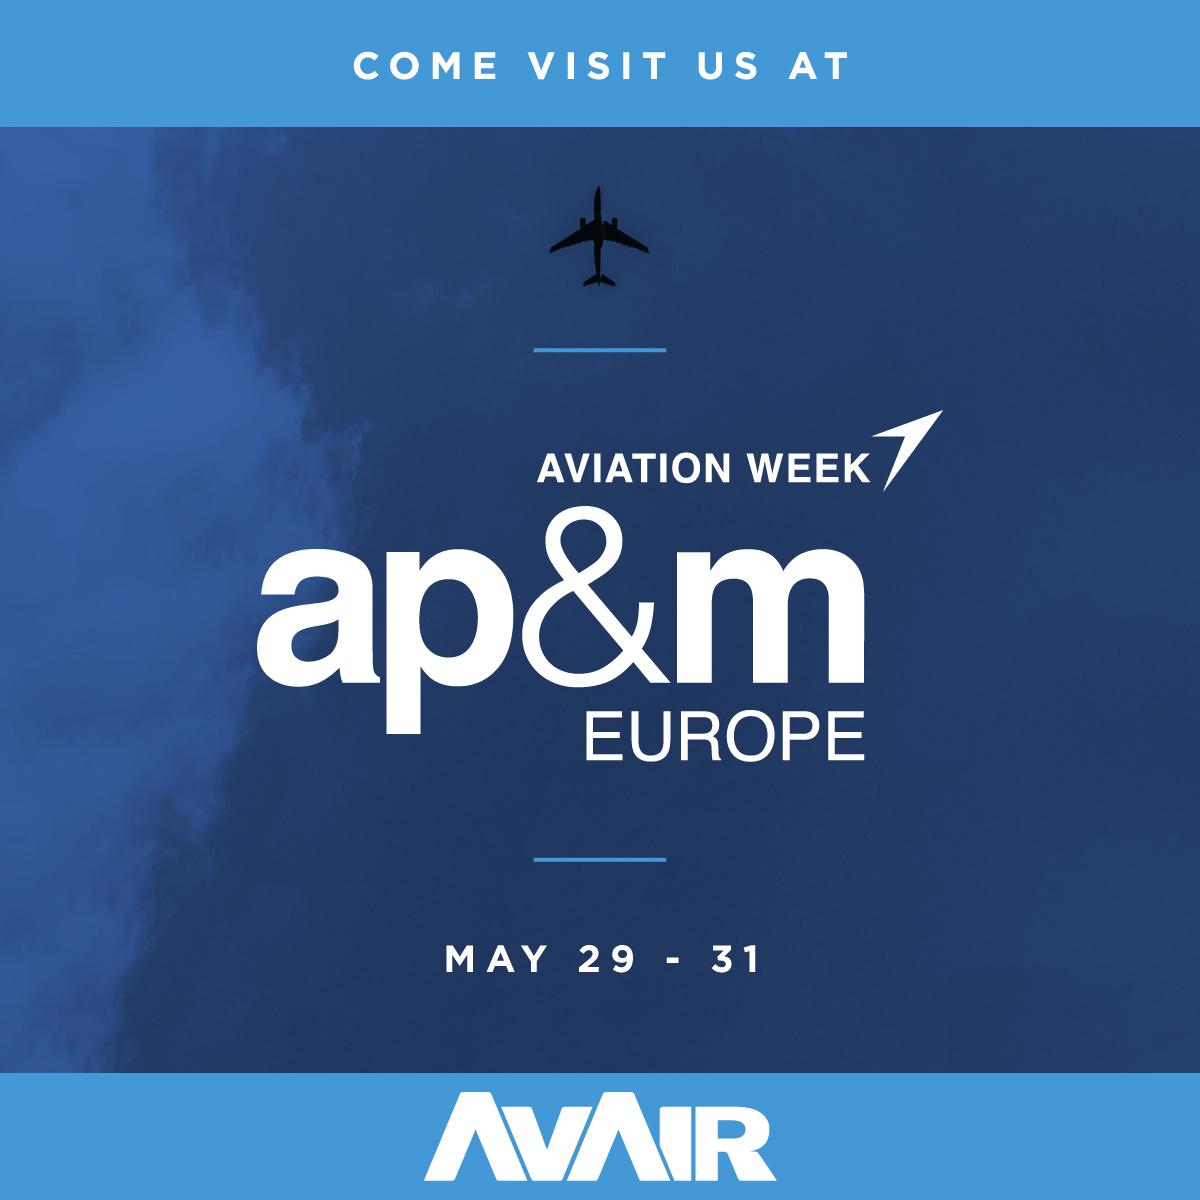 AvAir_VisitUsAnimation-mwm05222018